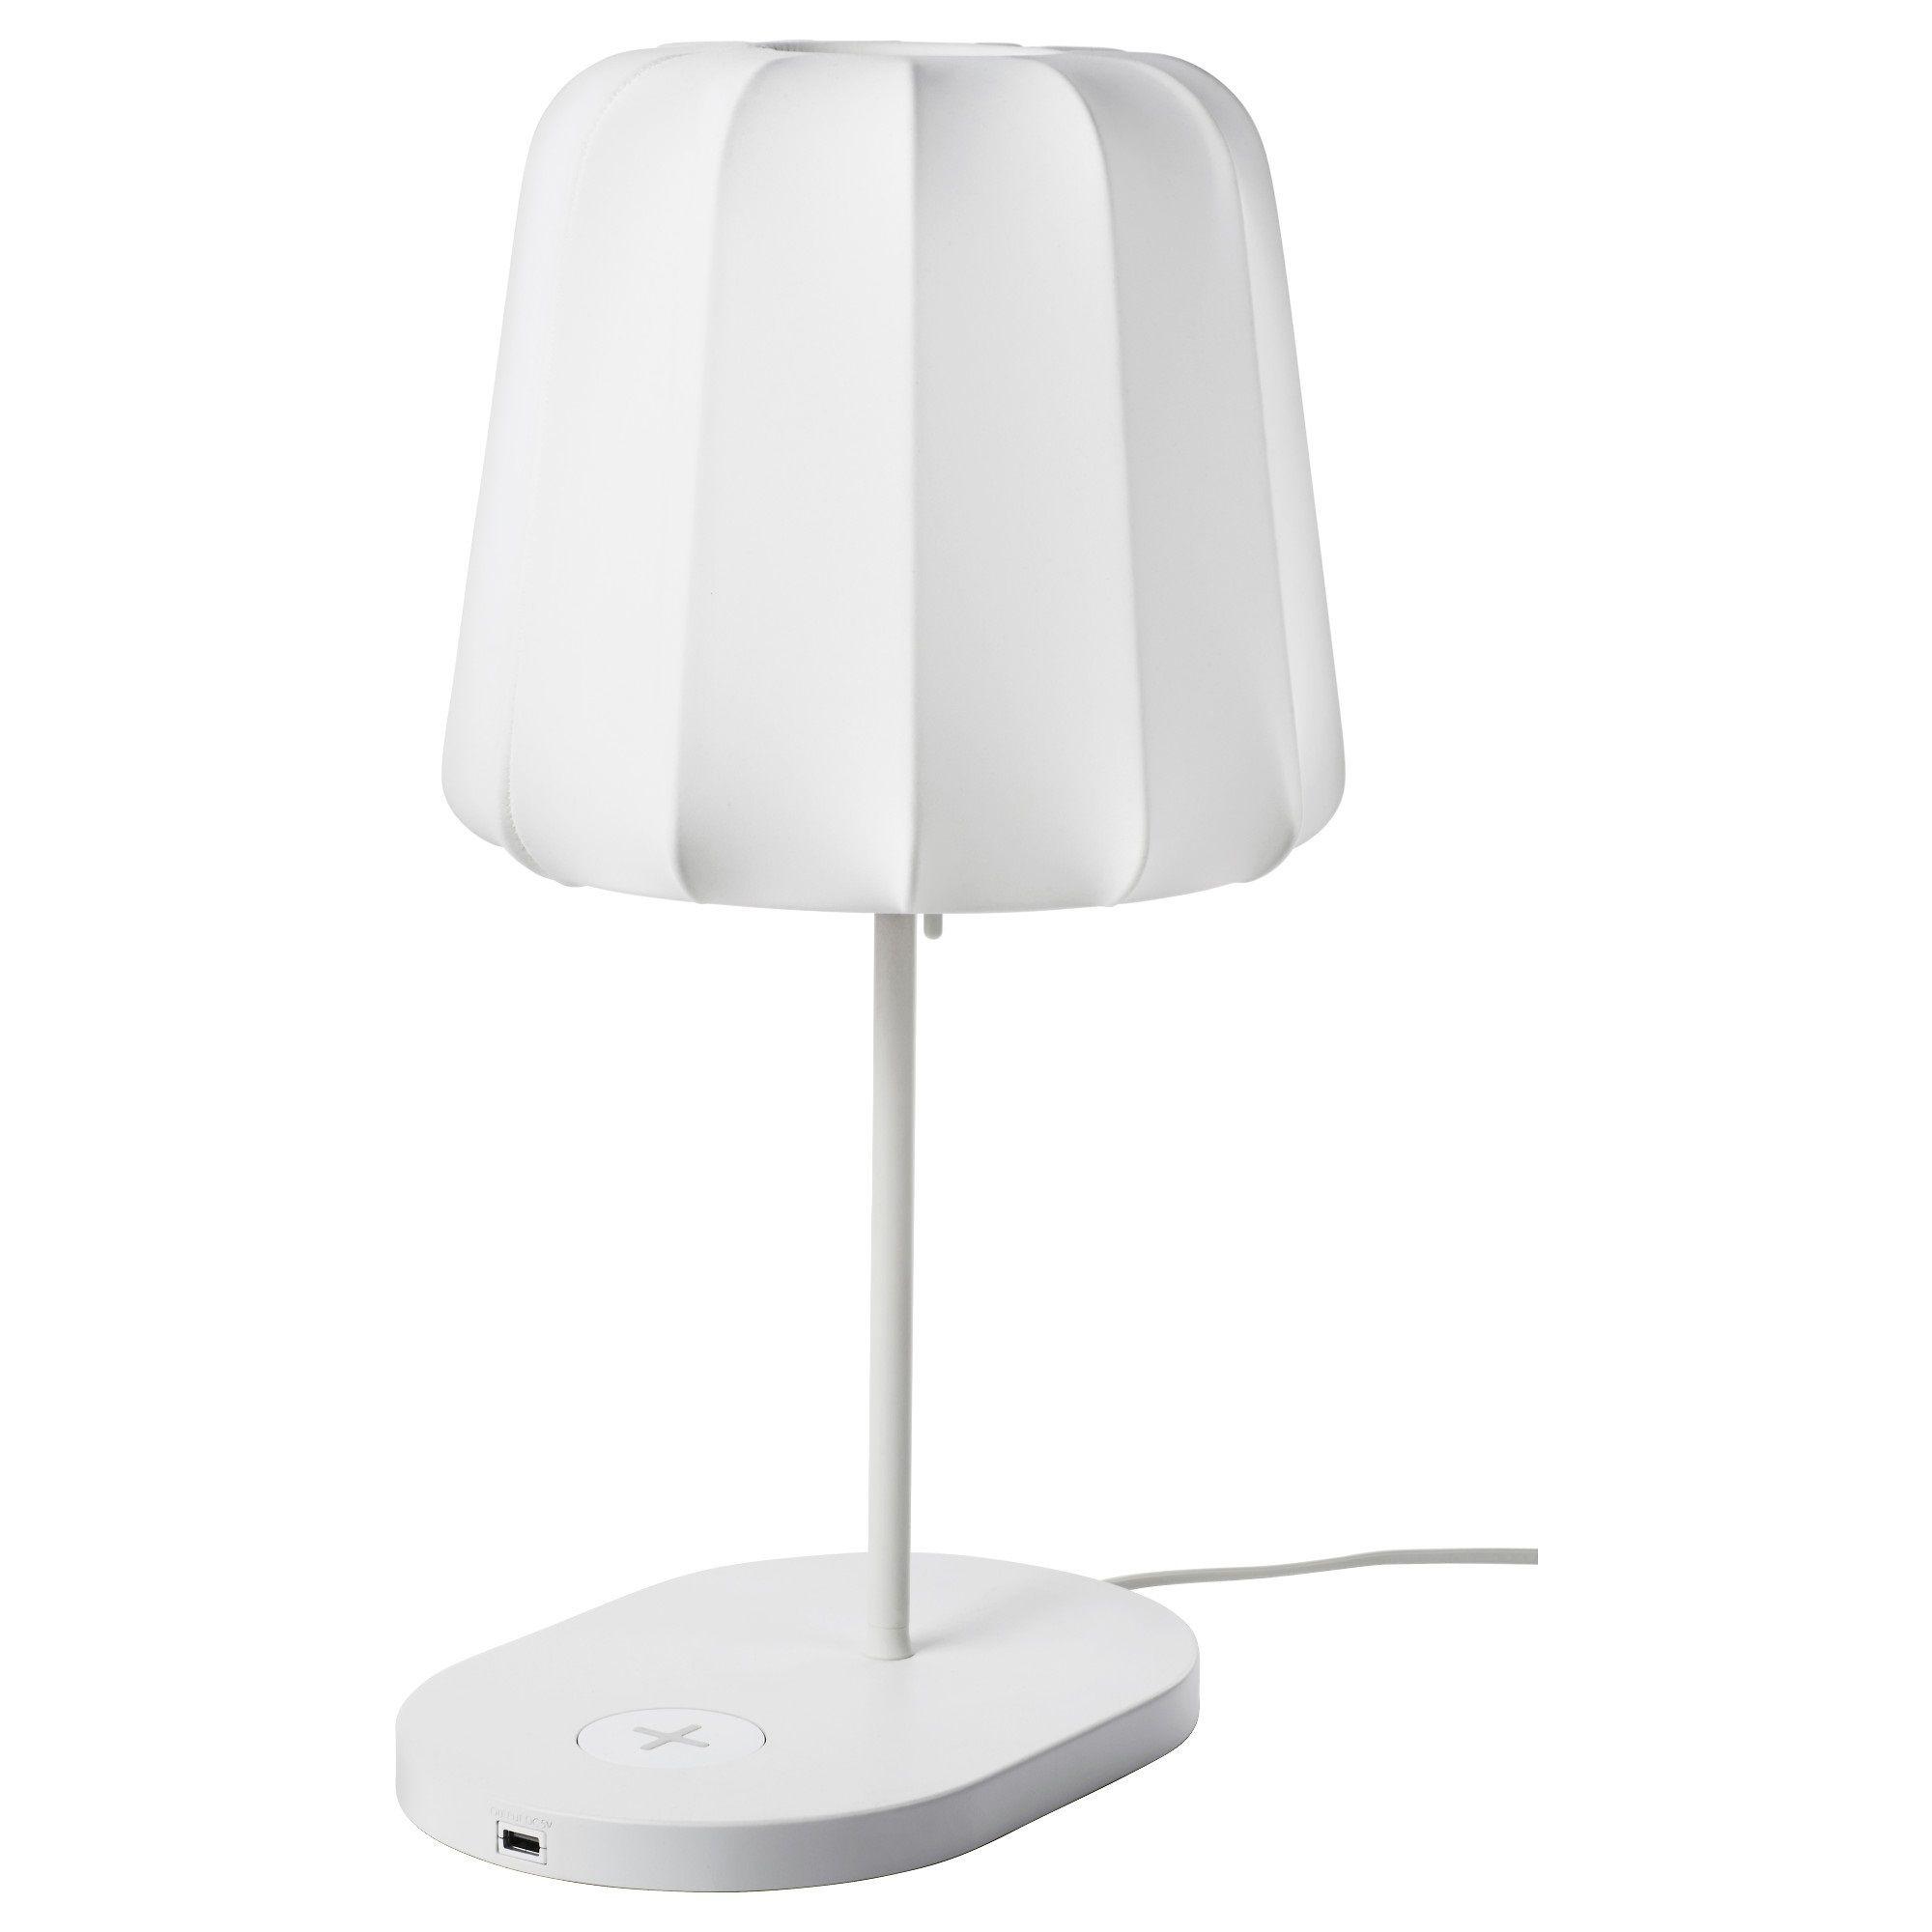 IKEA-lampen VARV. Foto: IKEA